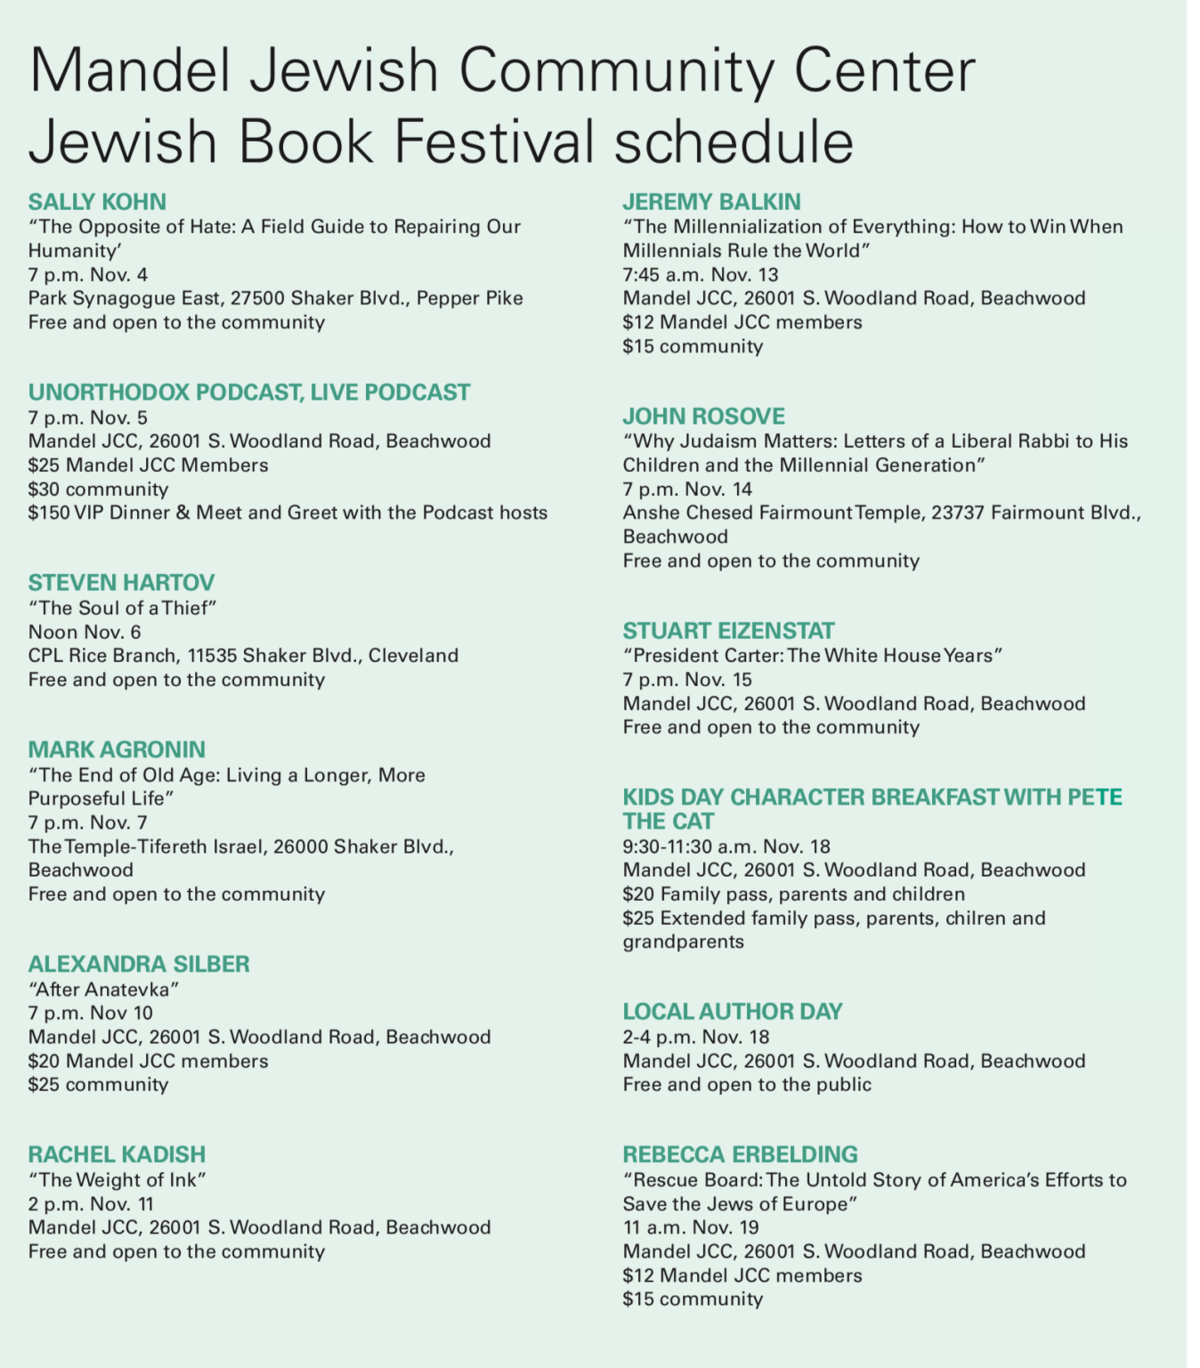 Mandel Jewish Community Center Jewish Book Festival Schedule